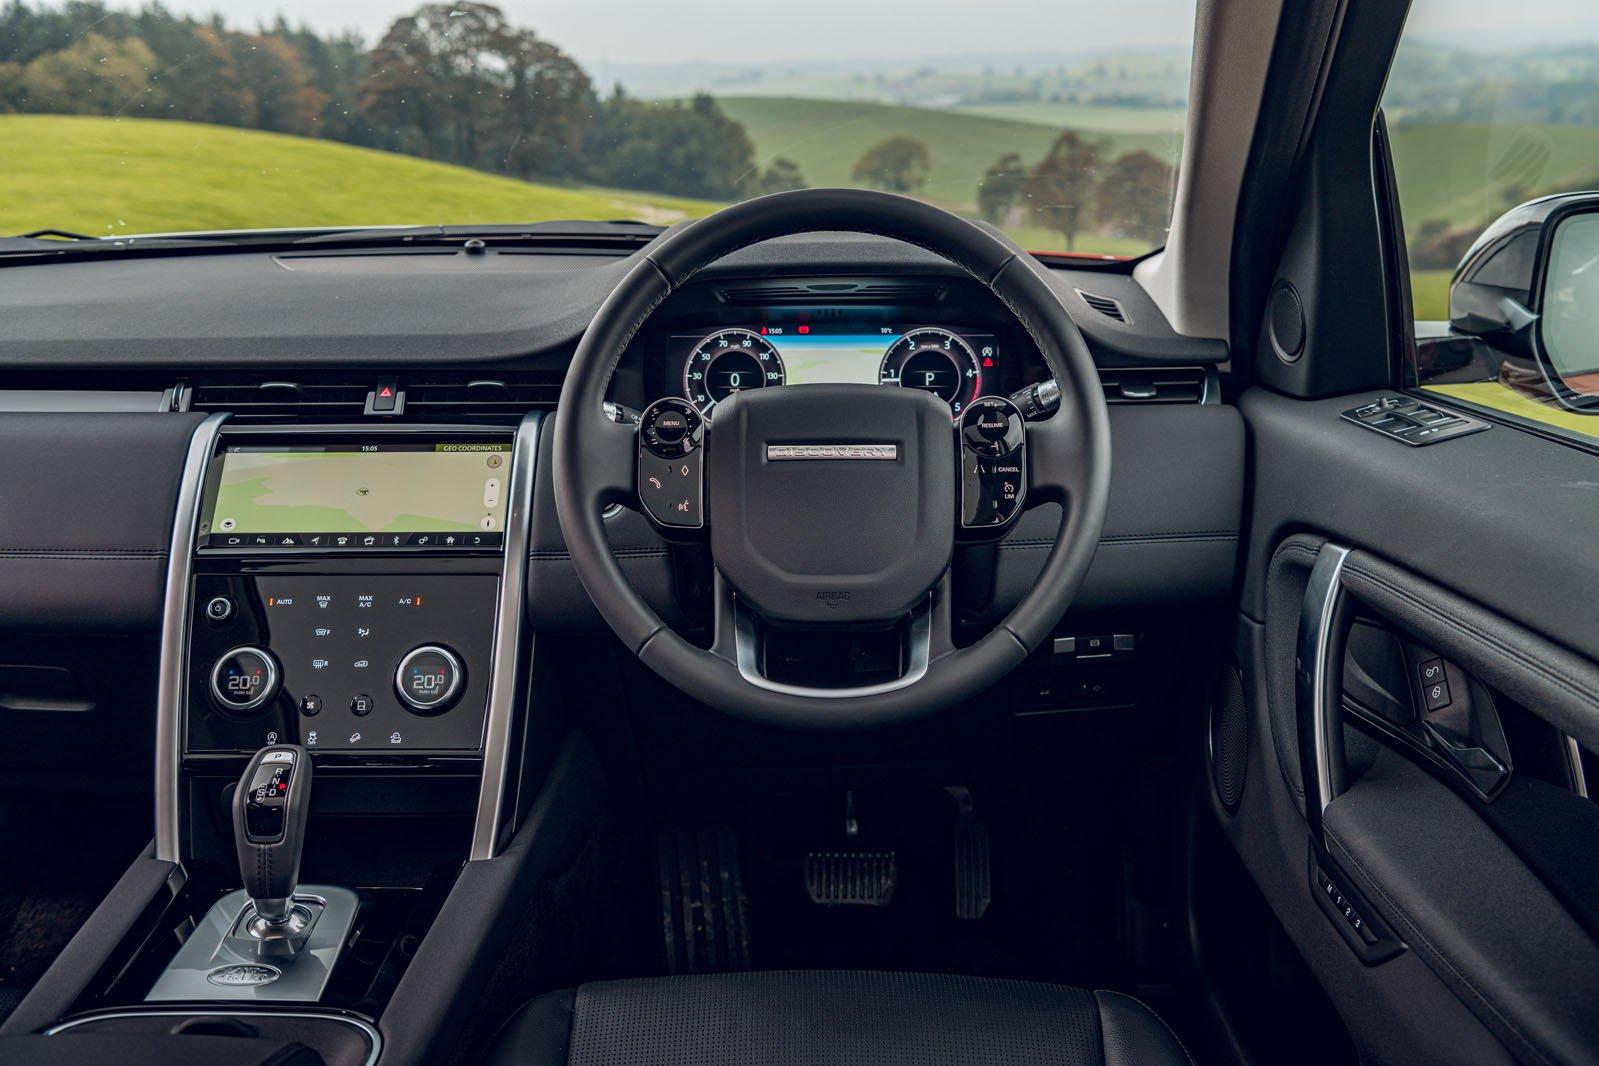 Land Rover Discovery Sport 2019 RHD dashboard